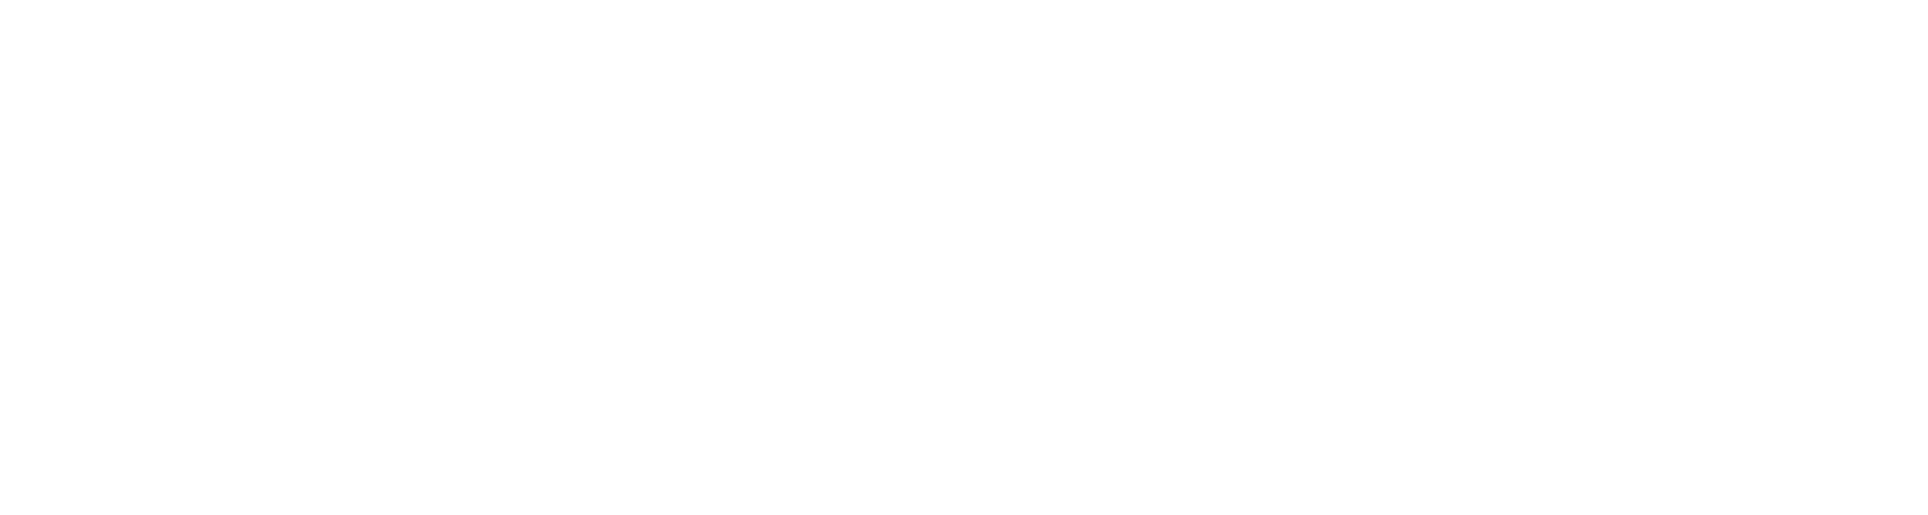 nec-logo-white